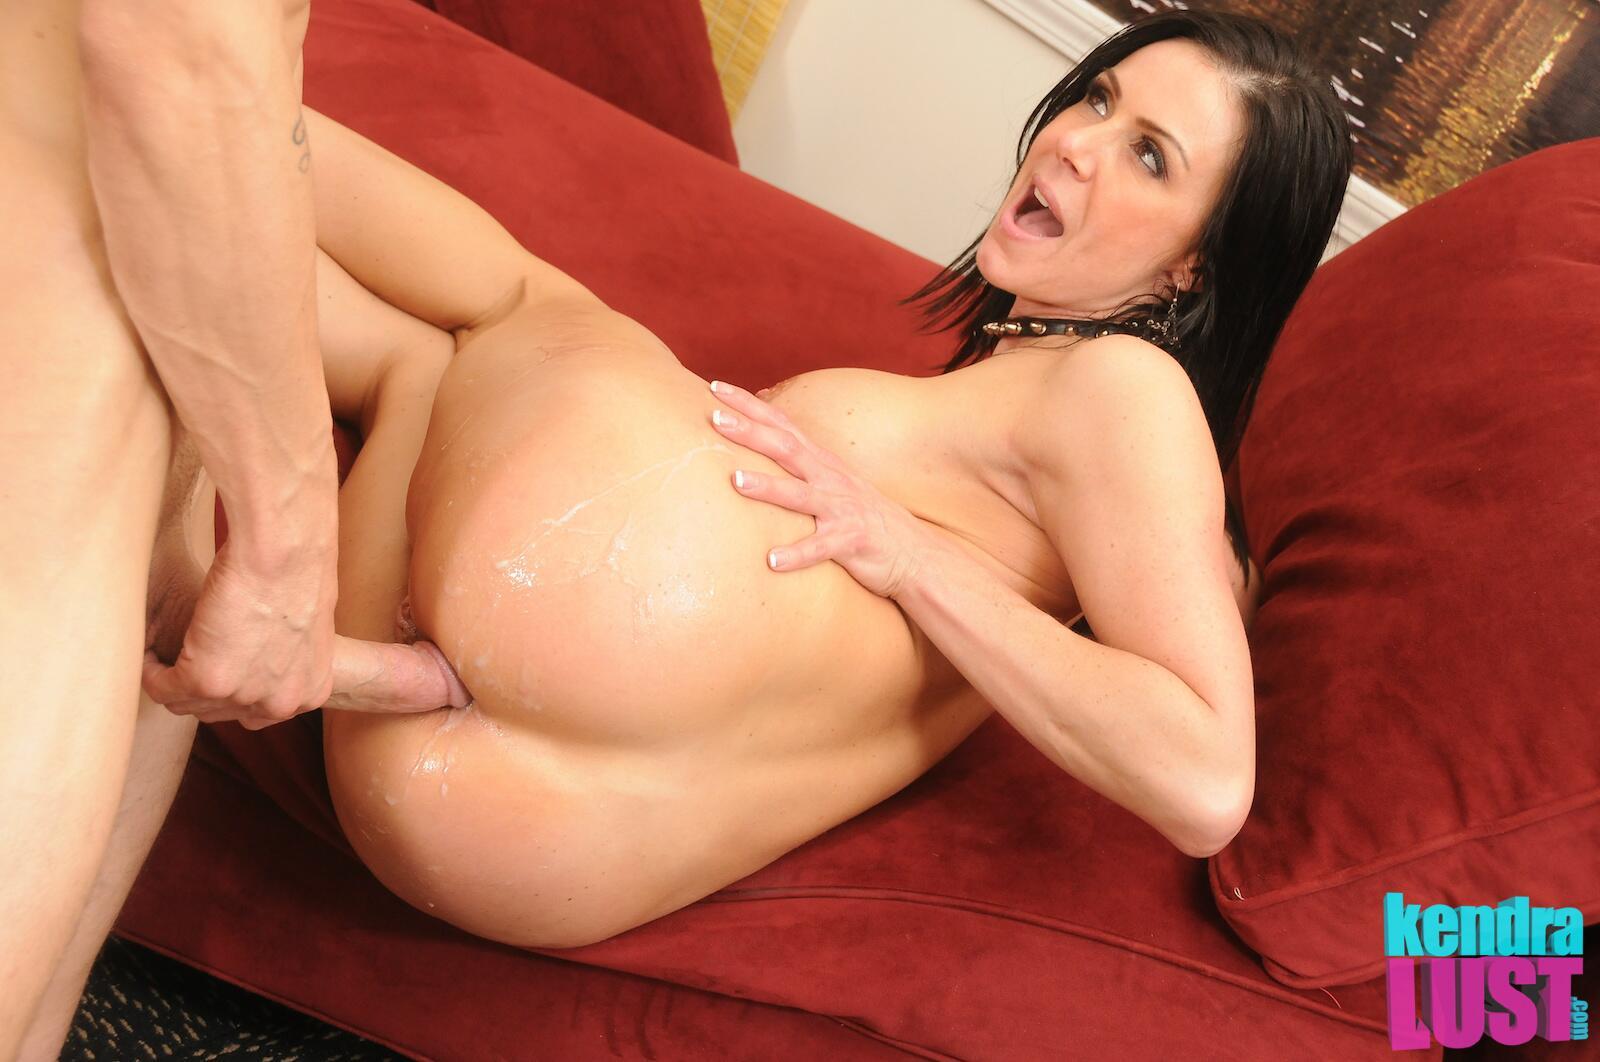 kendra lust anal dottoressa porno